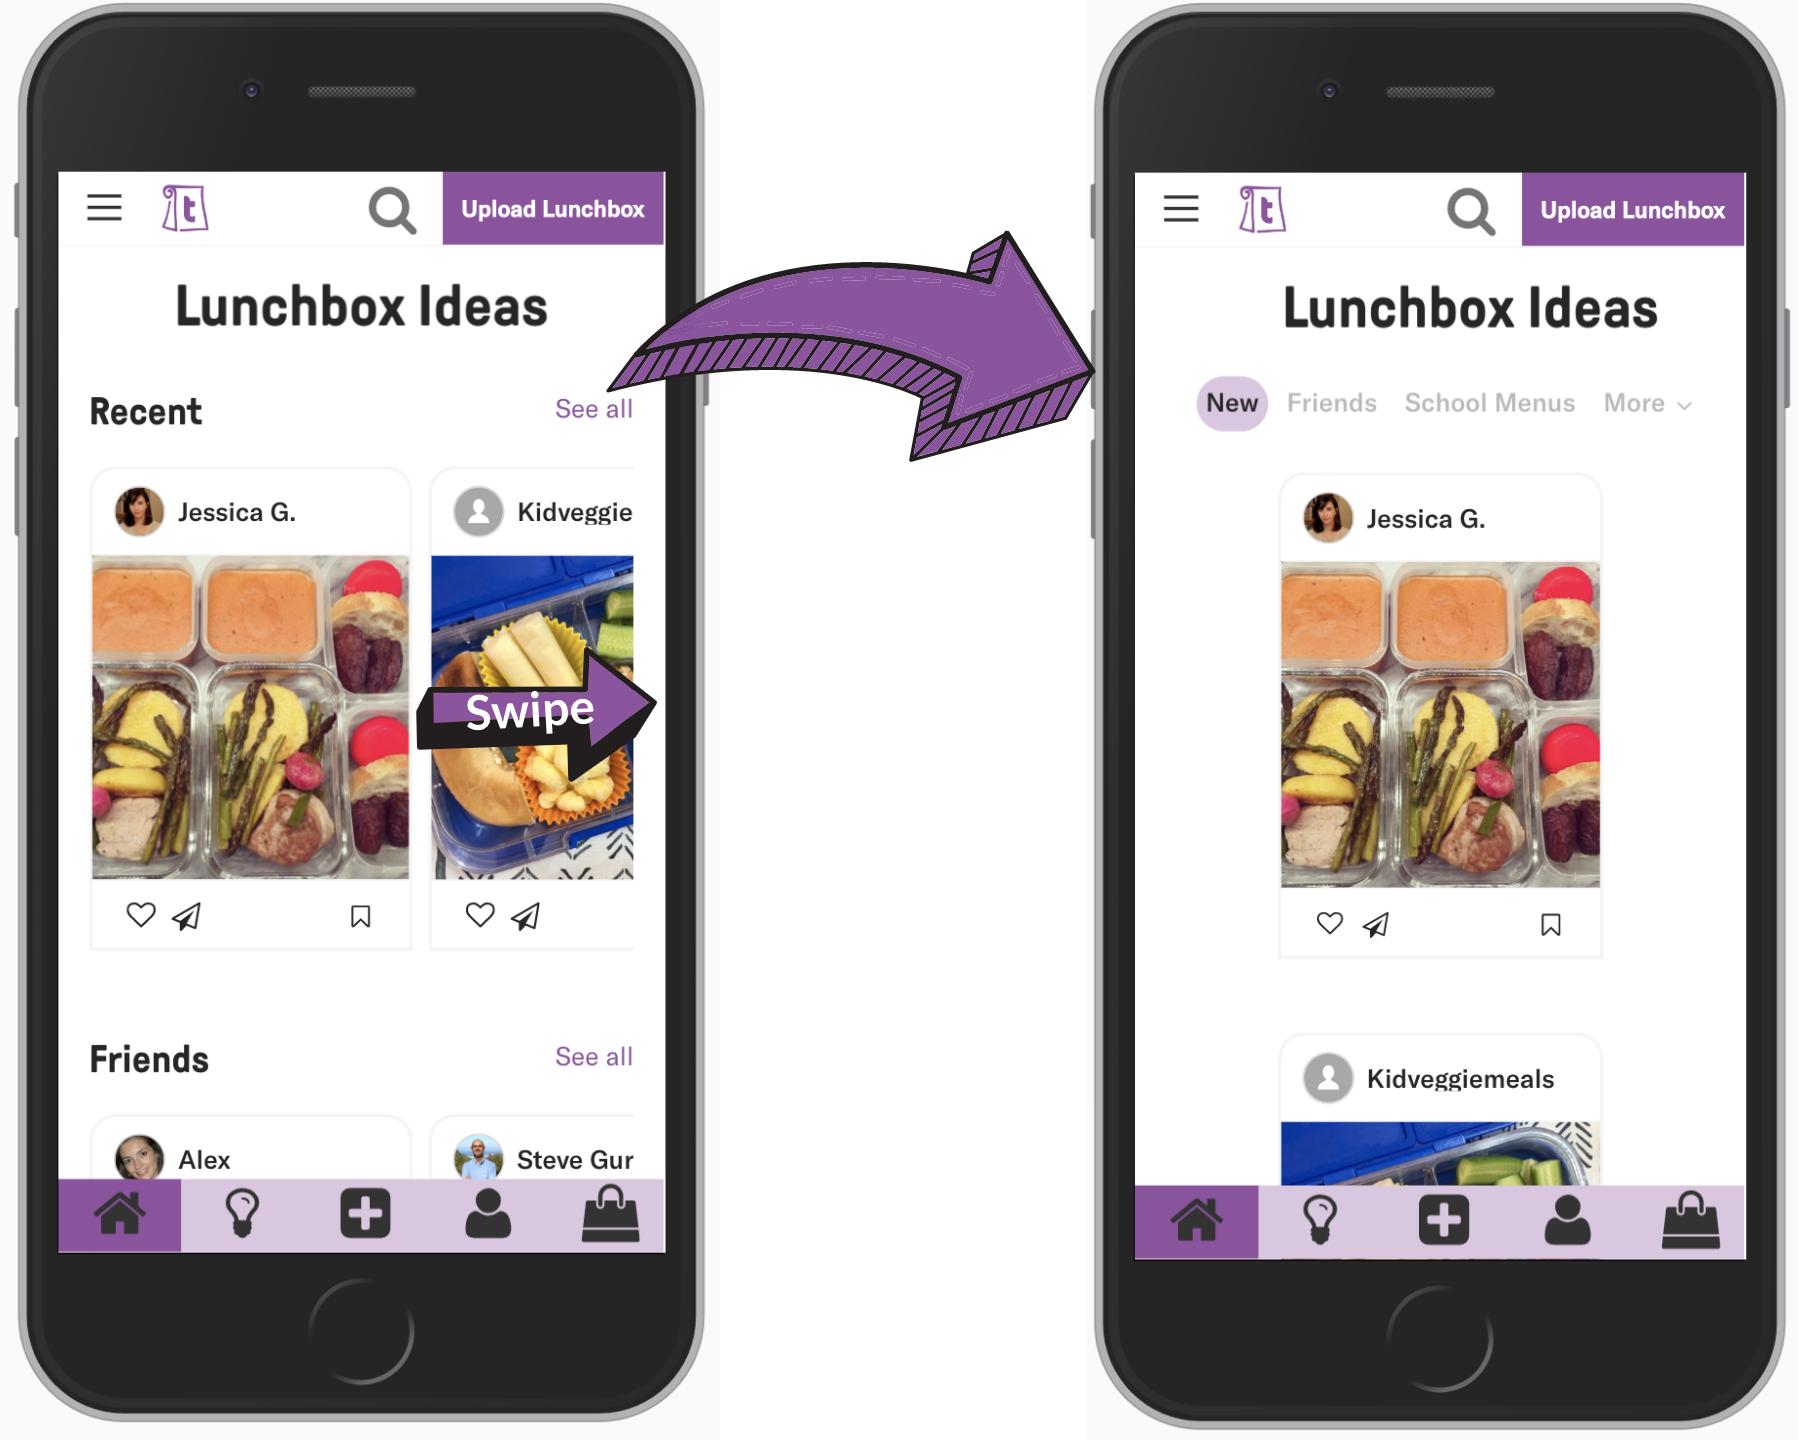 New Teuko Feed Netflix of lunchbox ideas